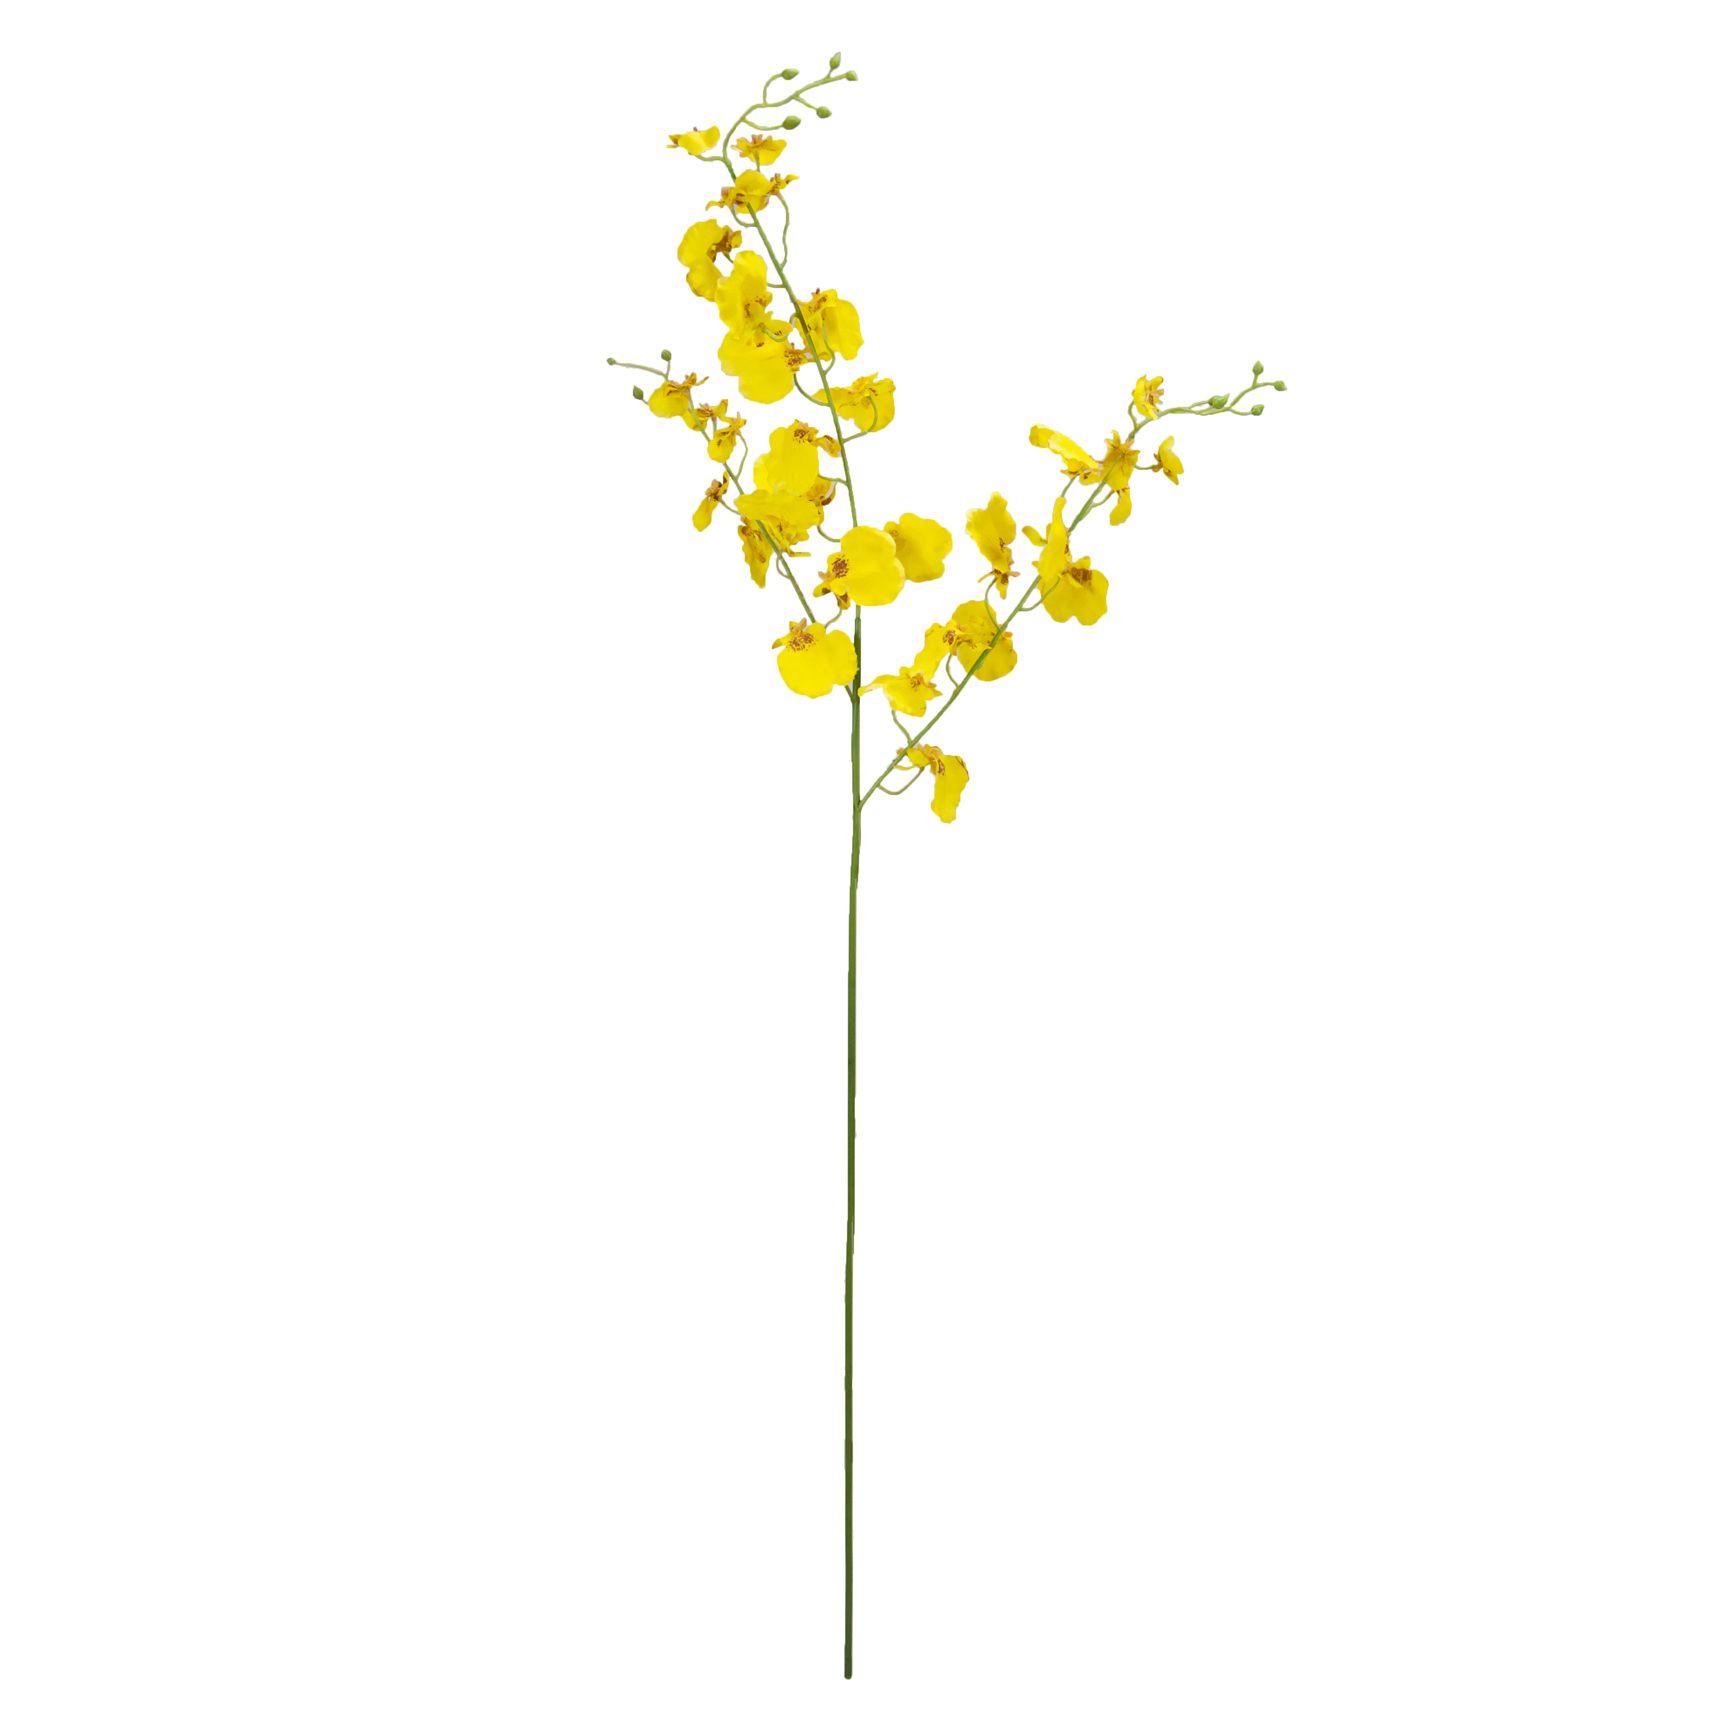 Orquídea Dançante 97 cm (dispon. em 02 cores)